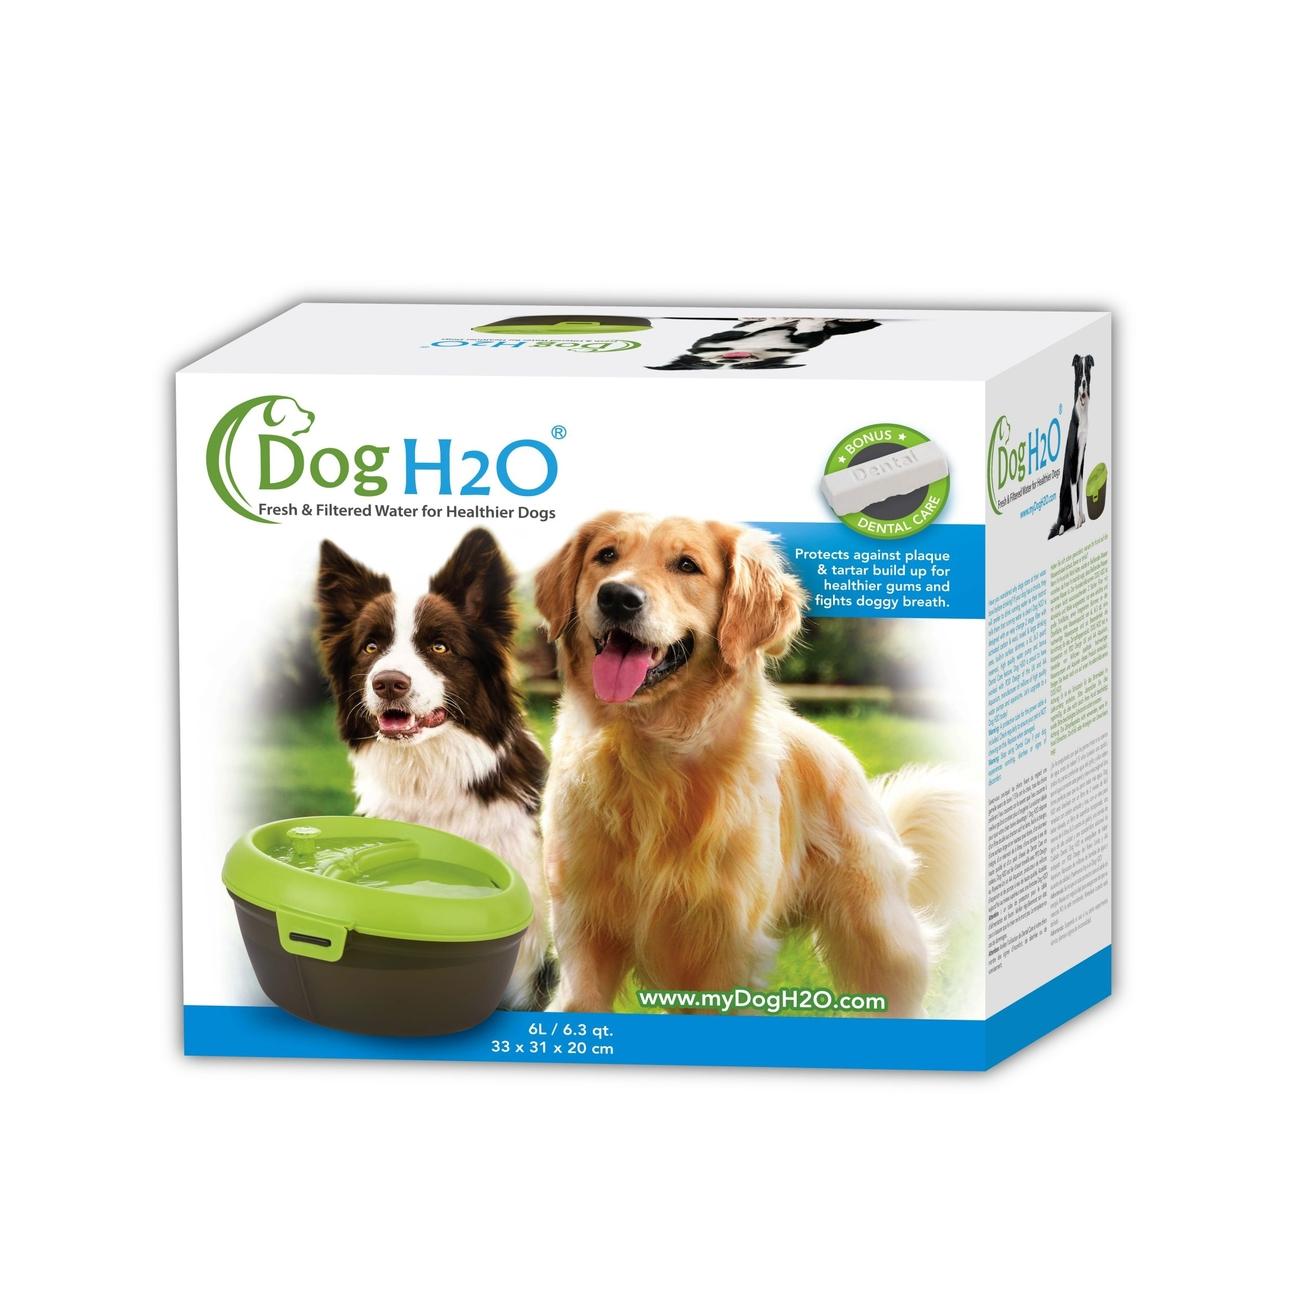 Dog H2O Hundetrinkbrunnen mit Zahnpflege, Bild 5